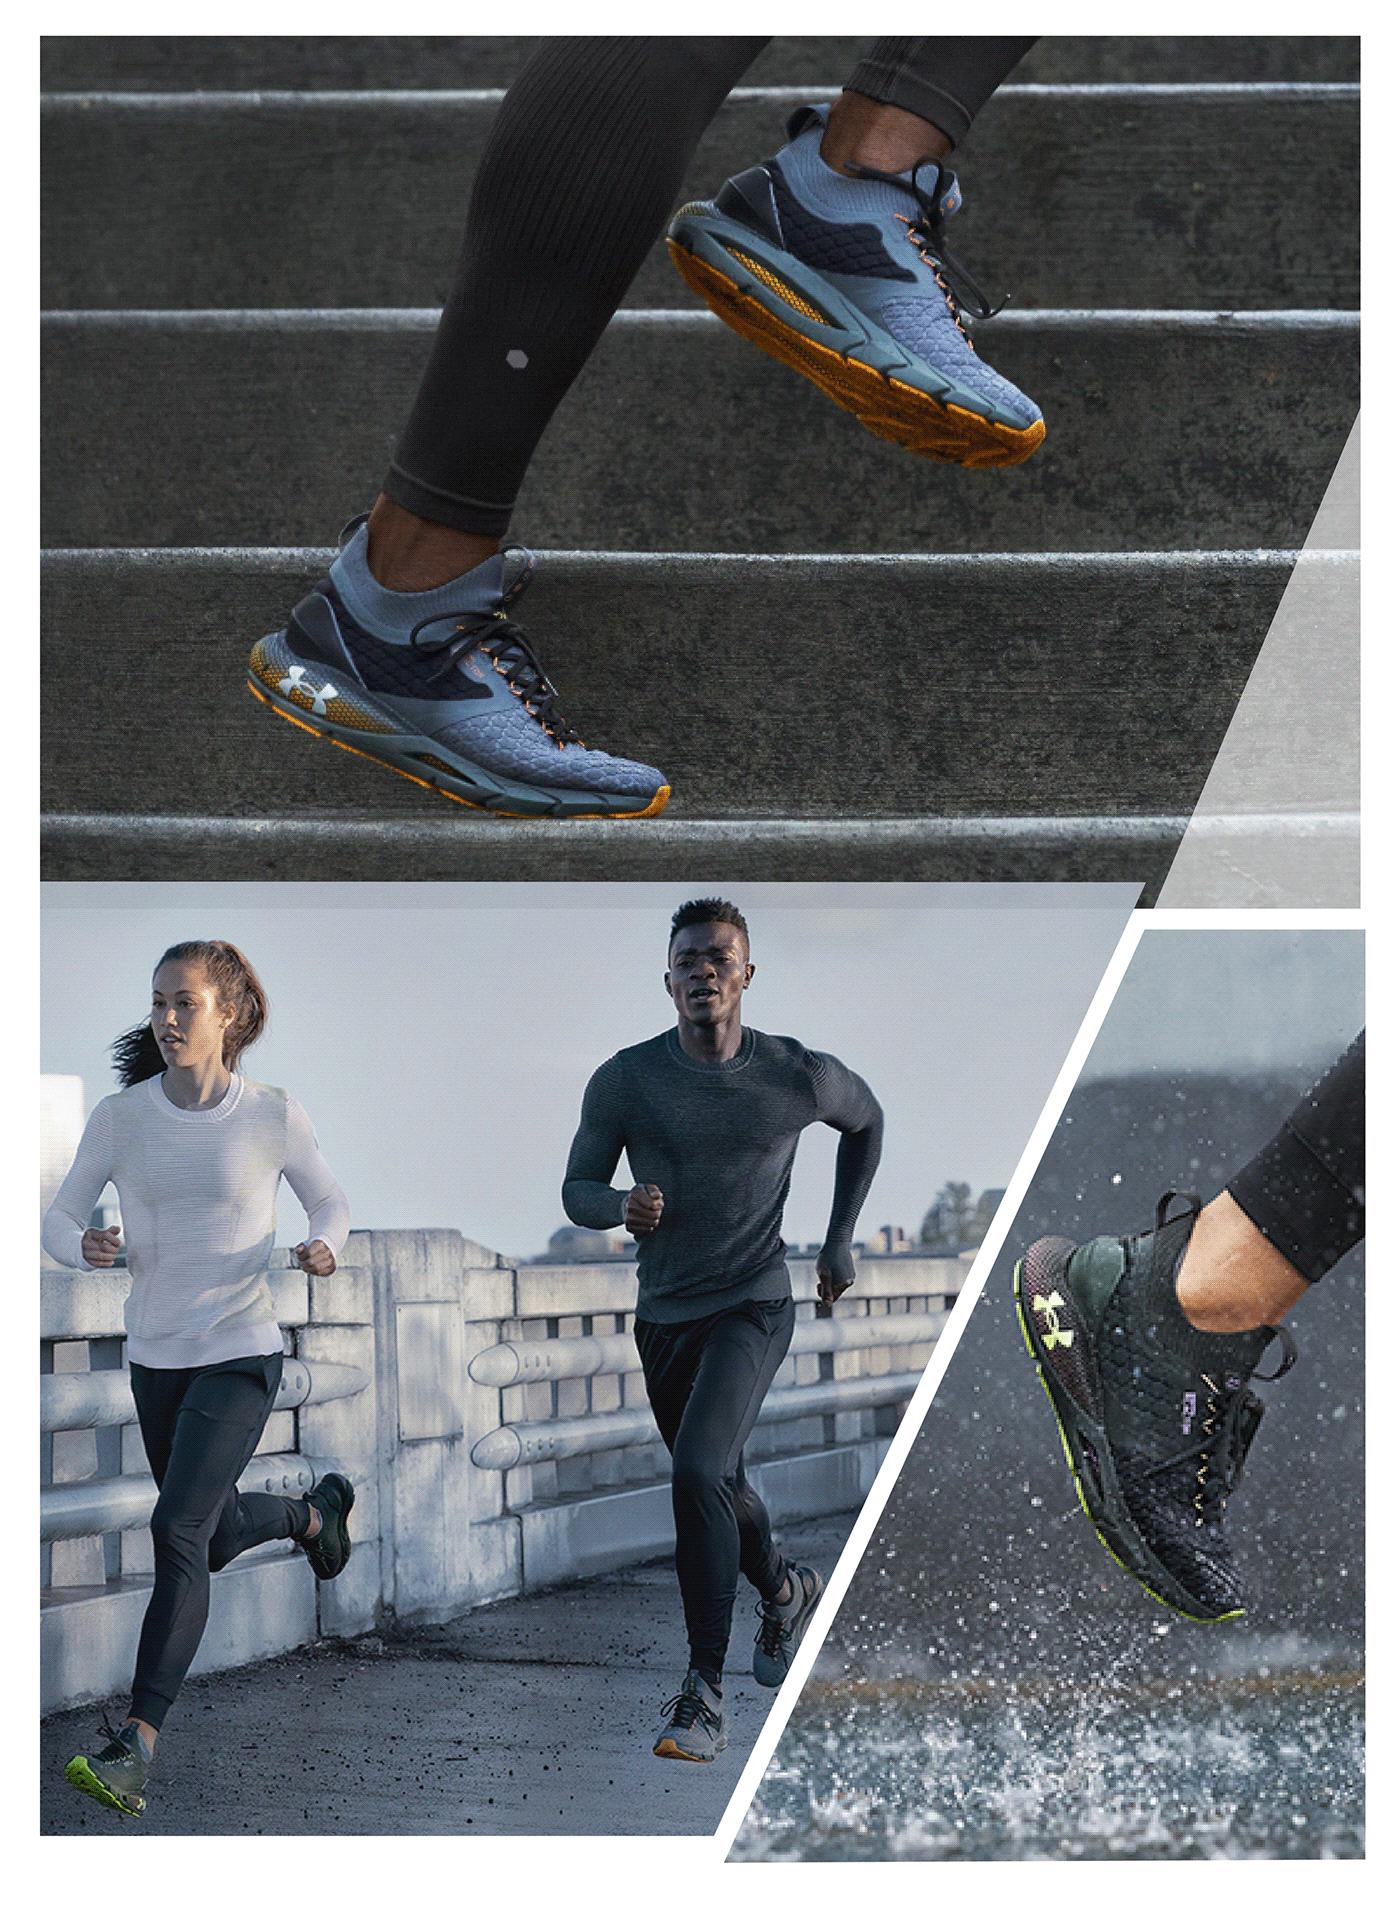 Image may contain: person, footwear and skating